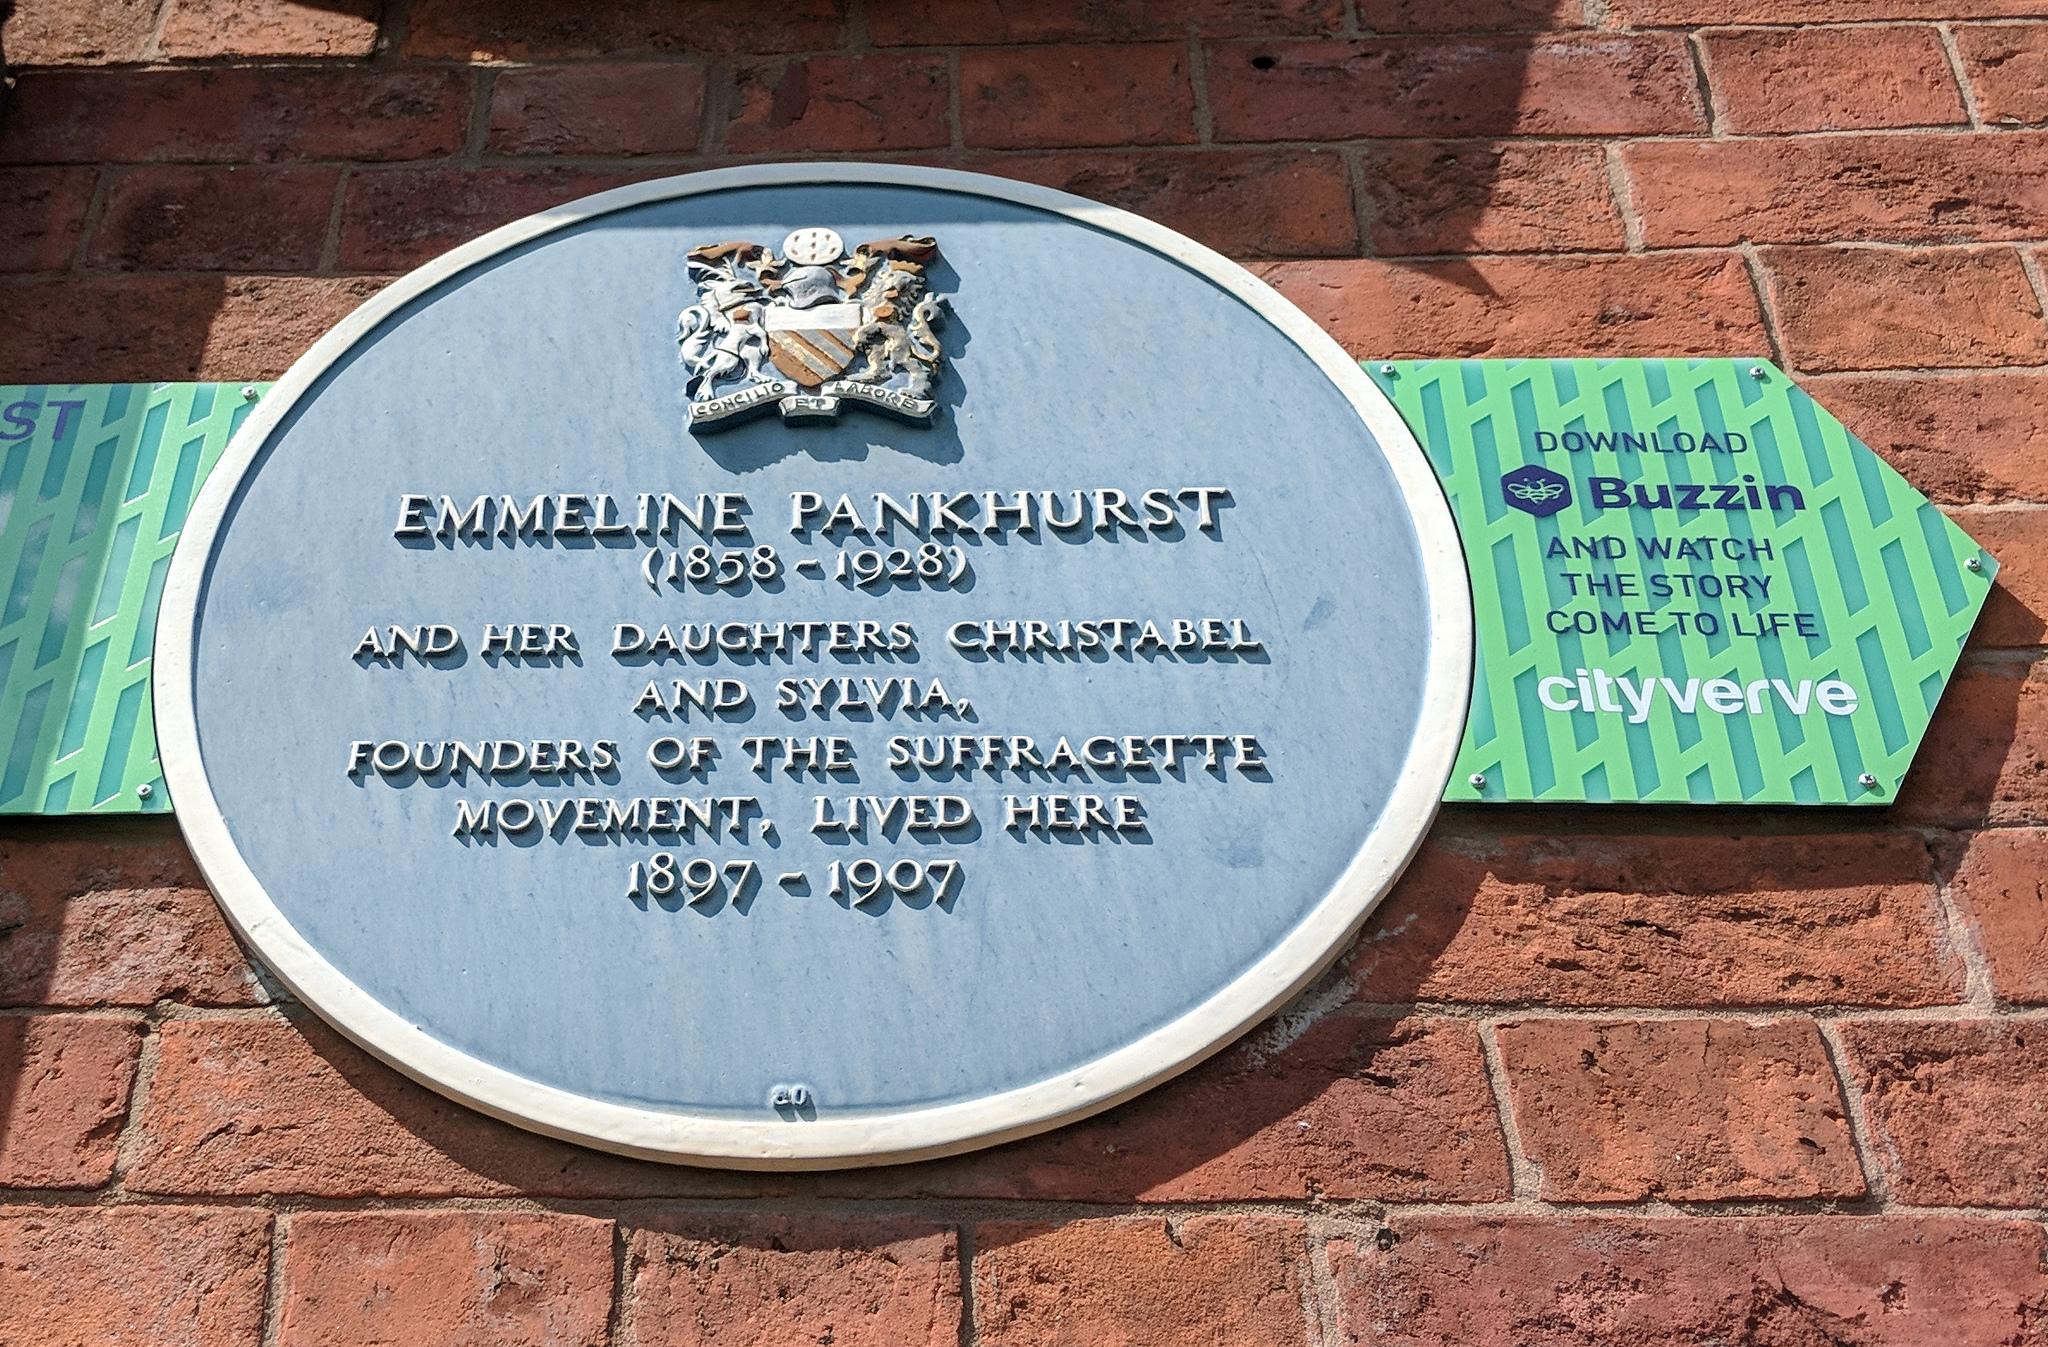 Emmeline Pankhurst plaque.